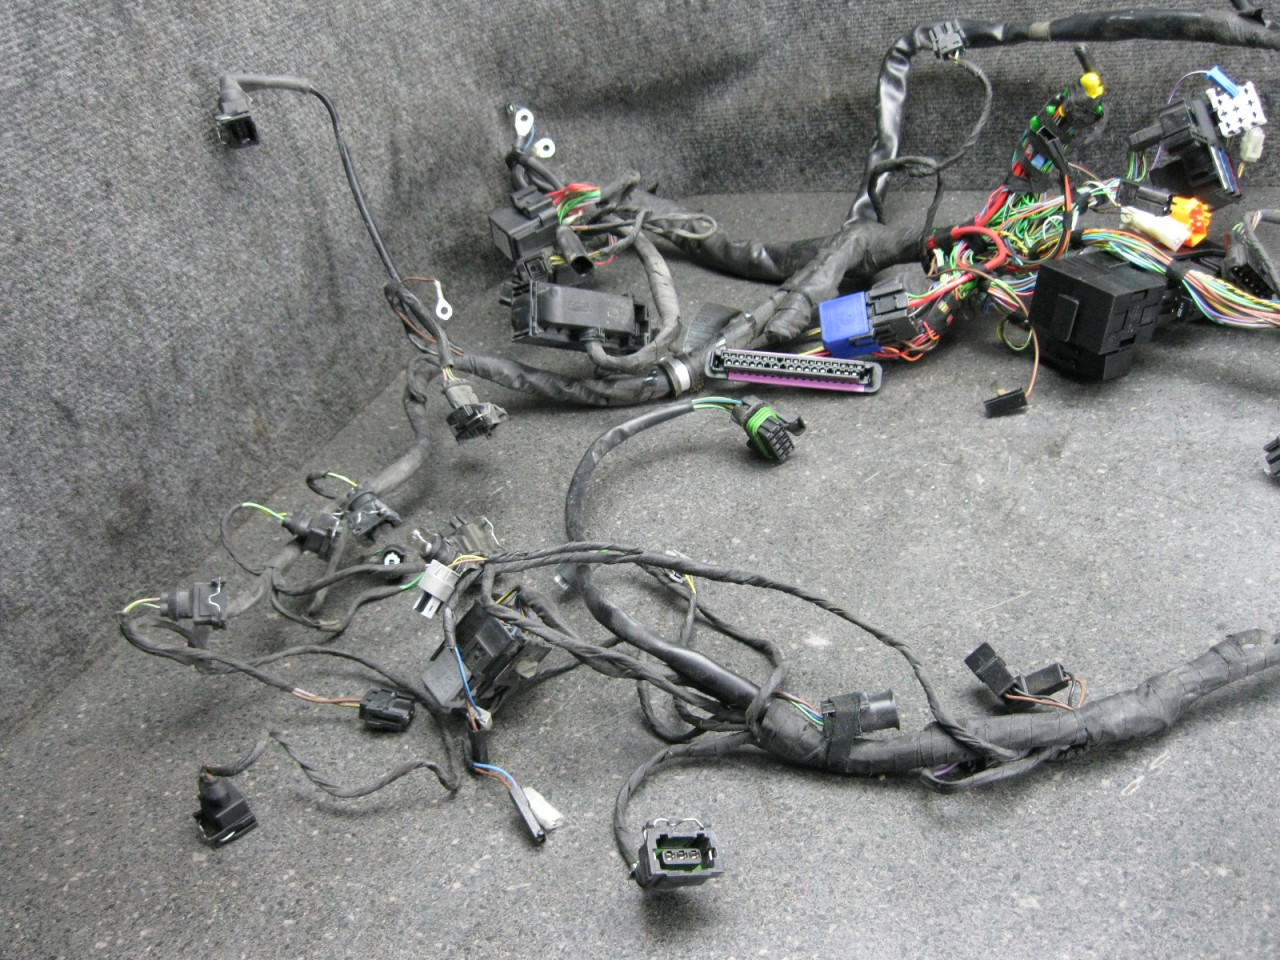 04 Bmw K1200gt K1200 Gt Wiring Wire Harness Loom 69f